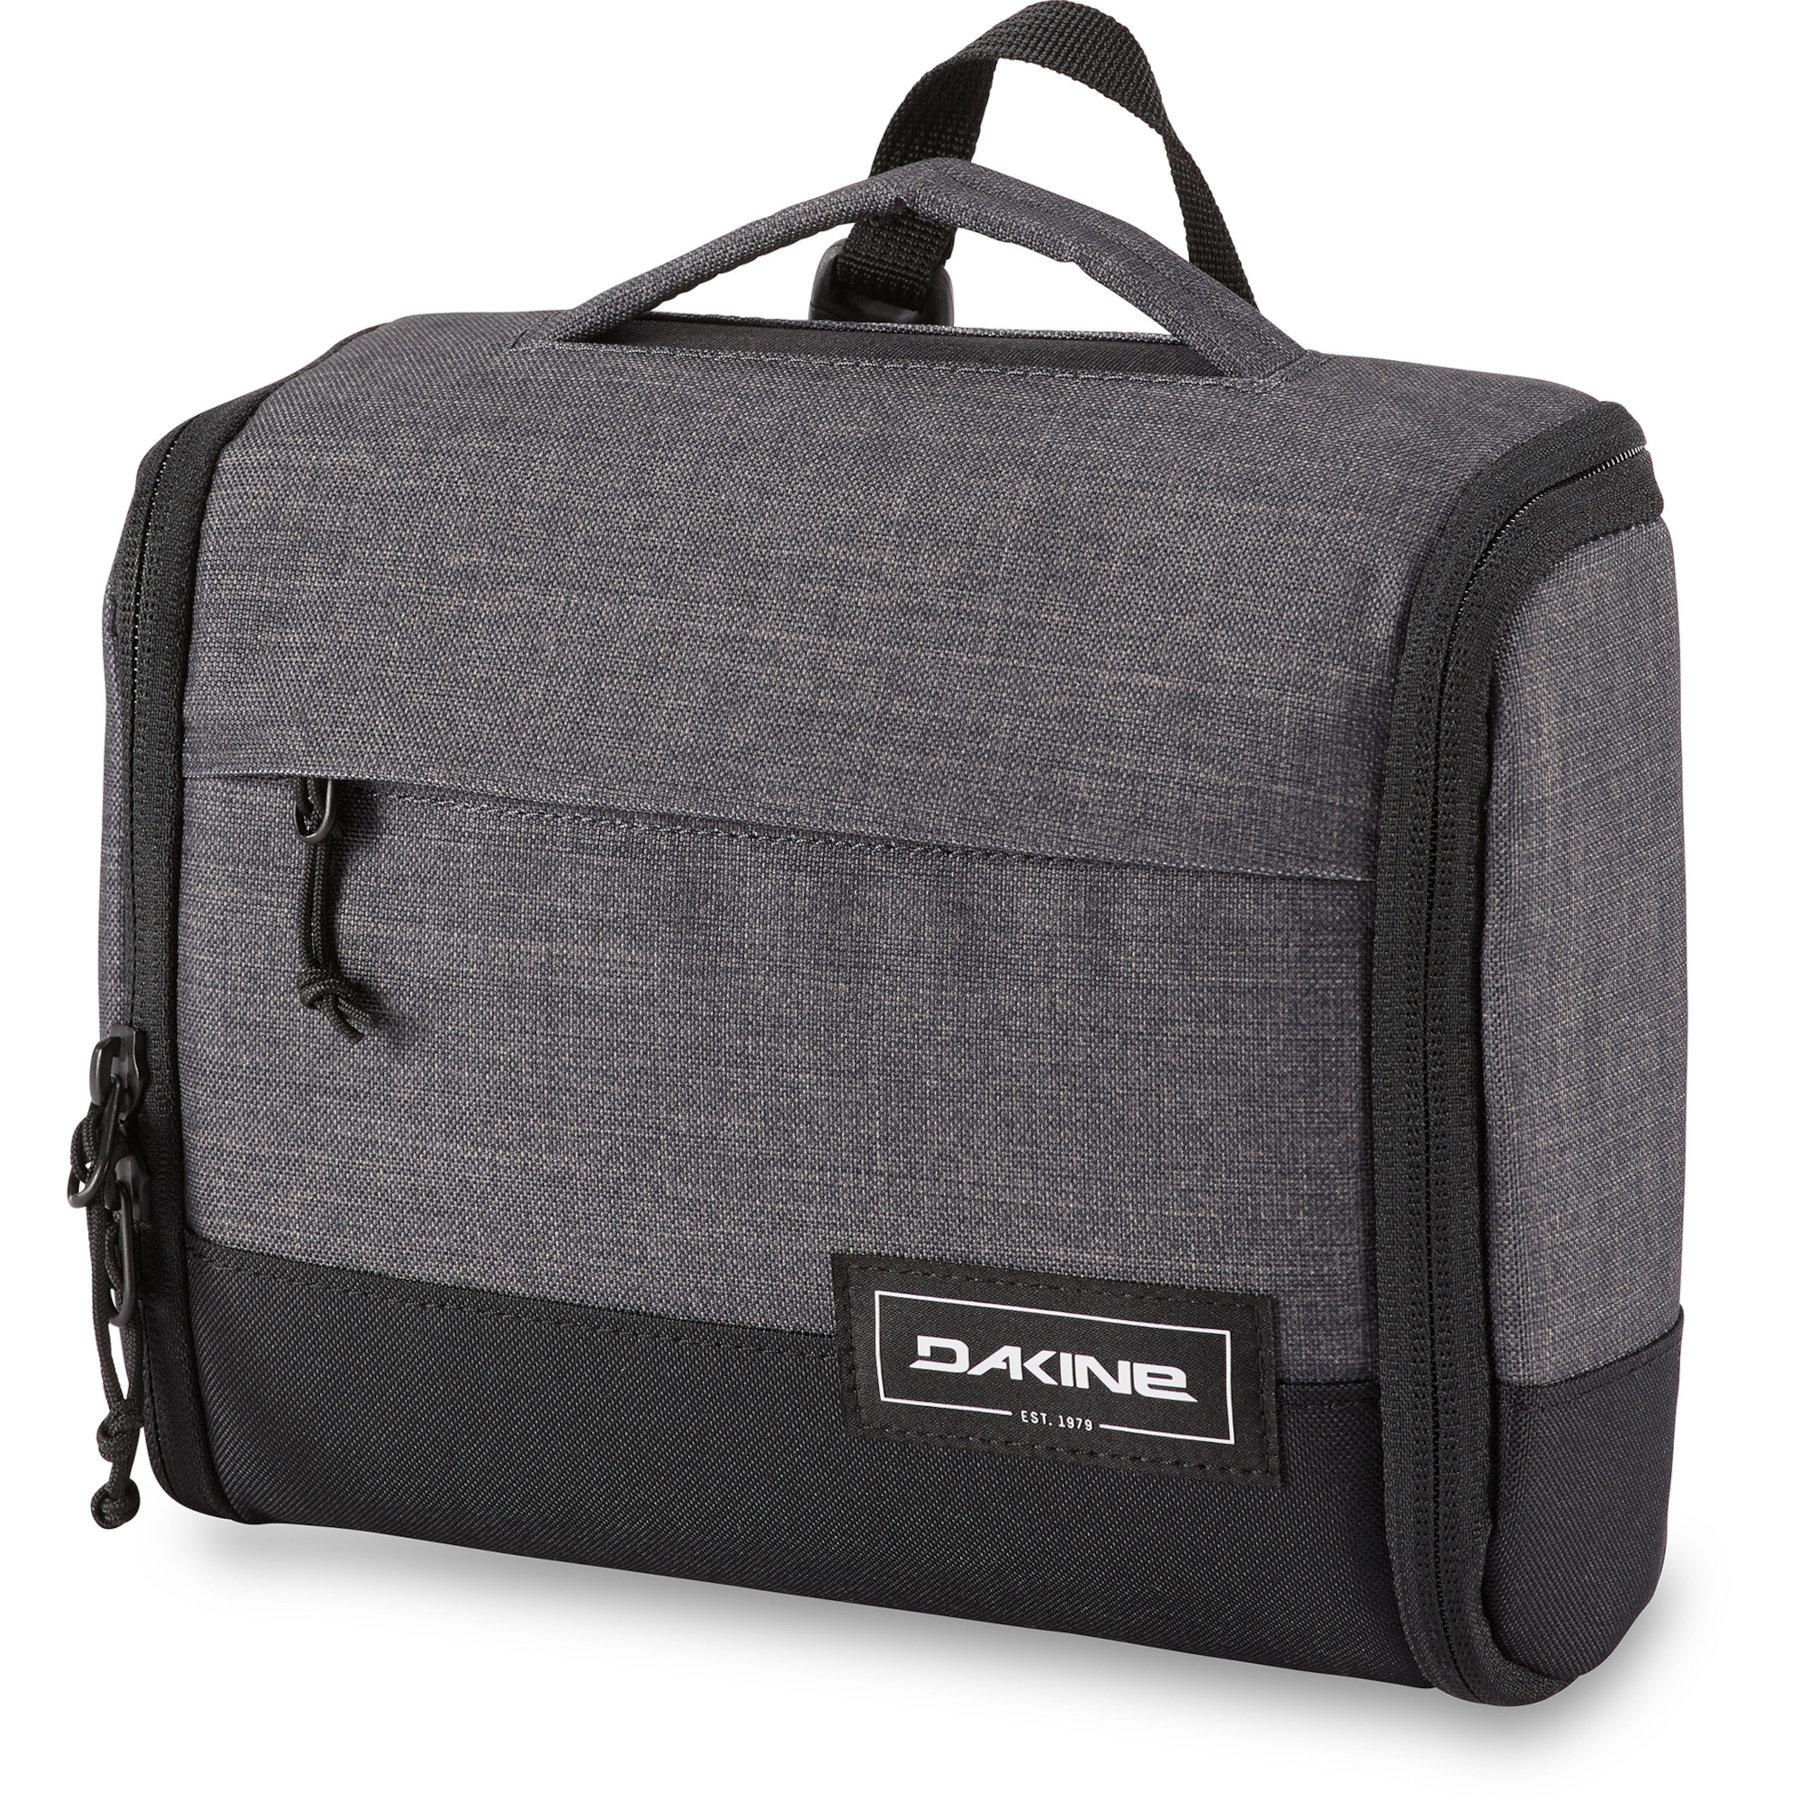 Dakine Daybreak Travel Kit M - Carbon